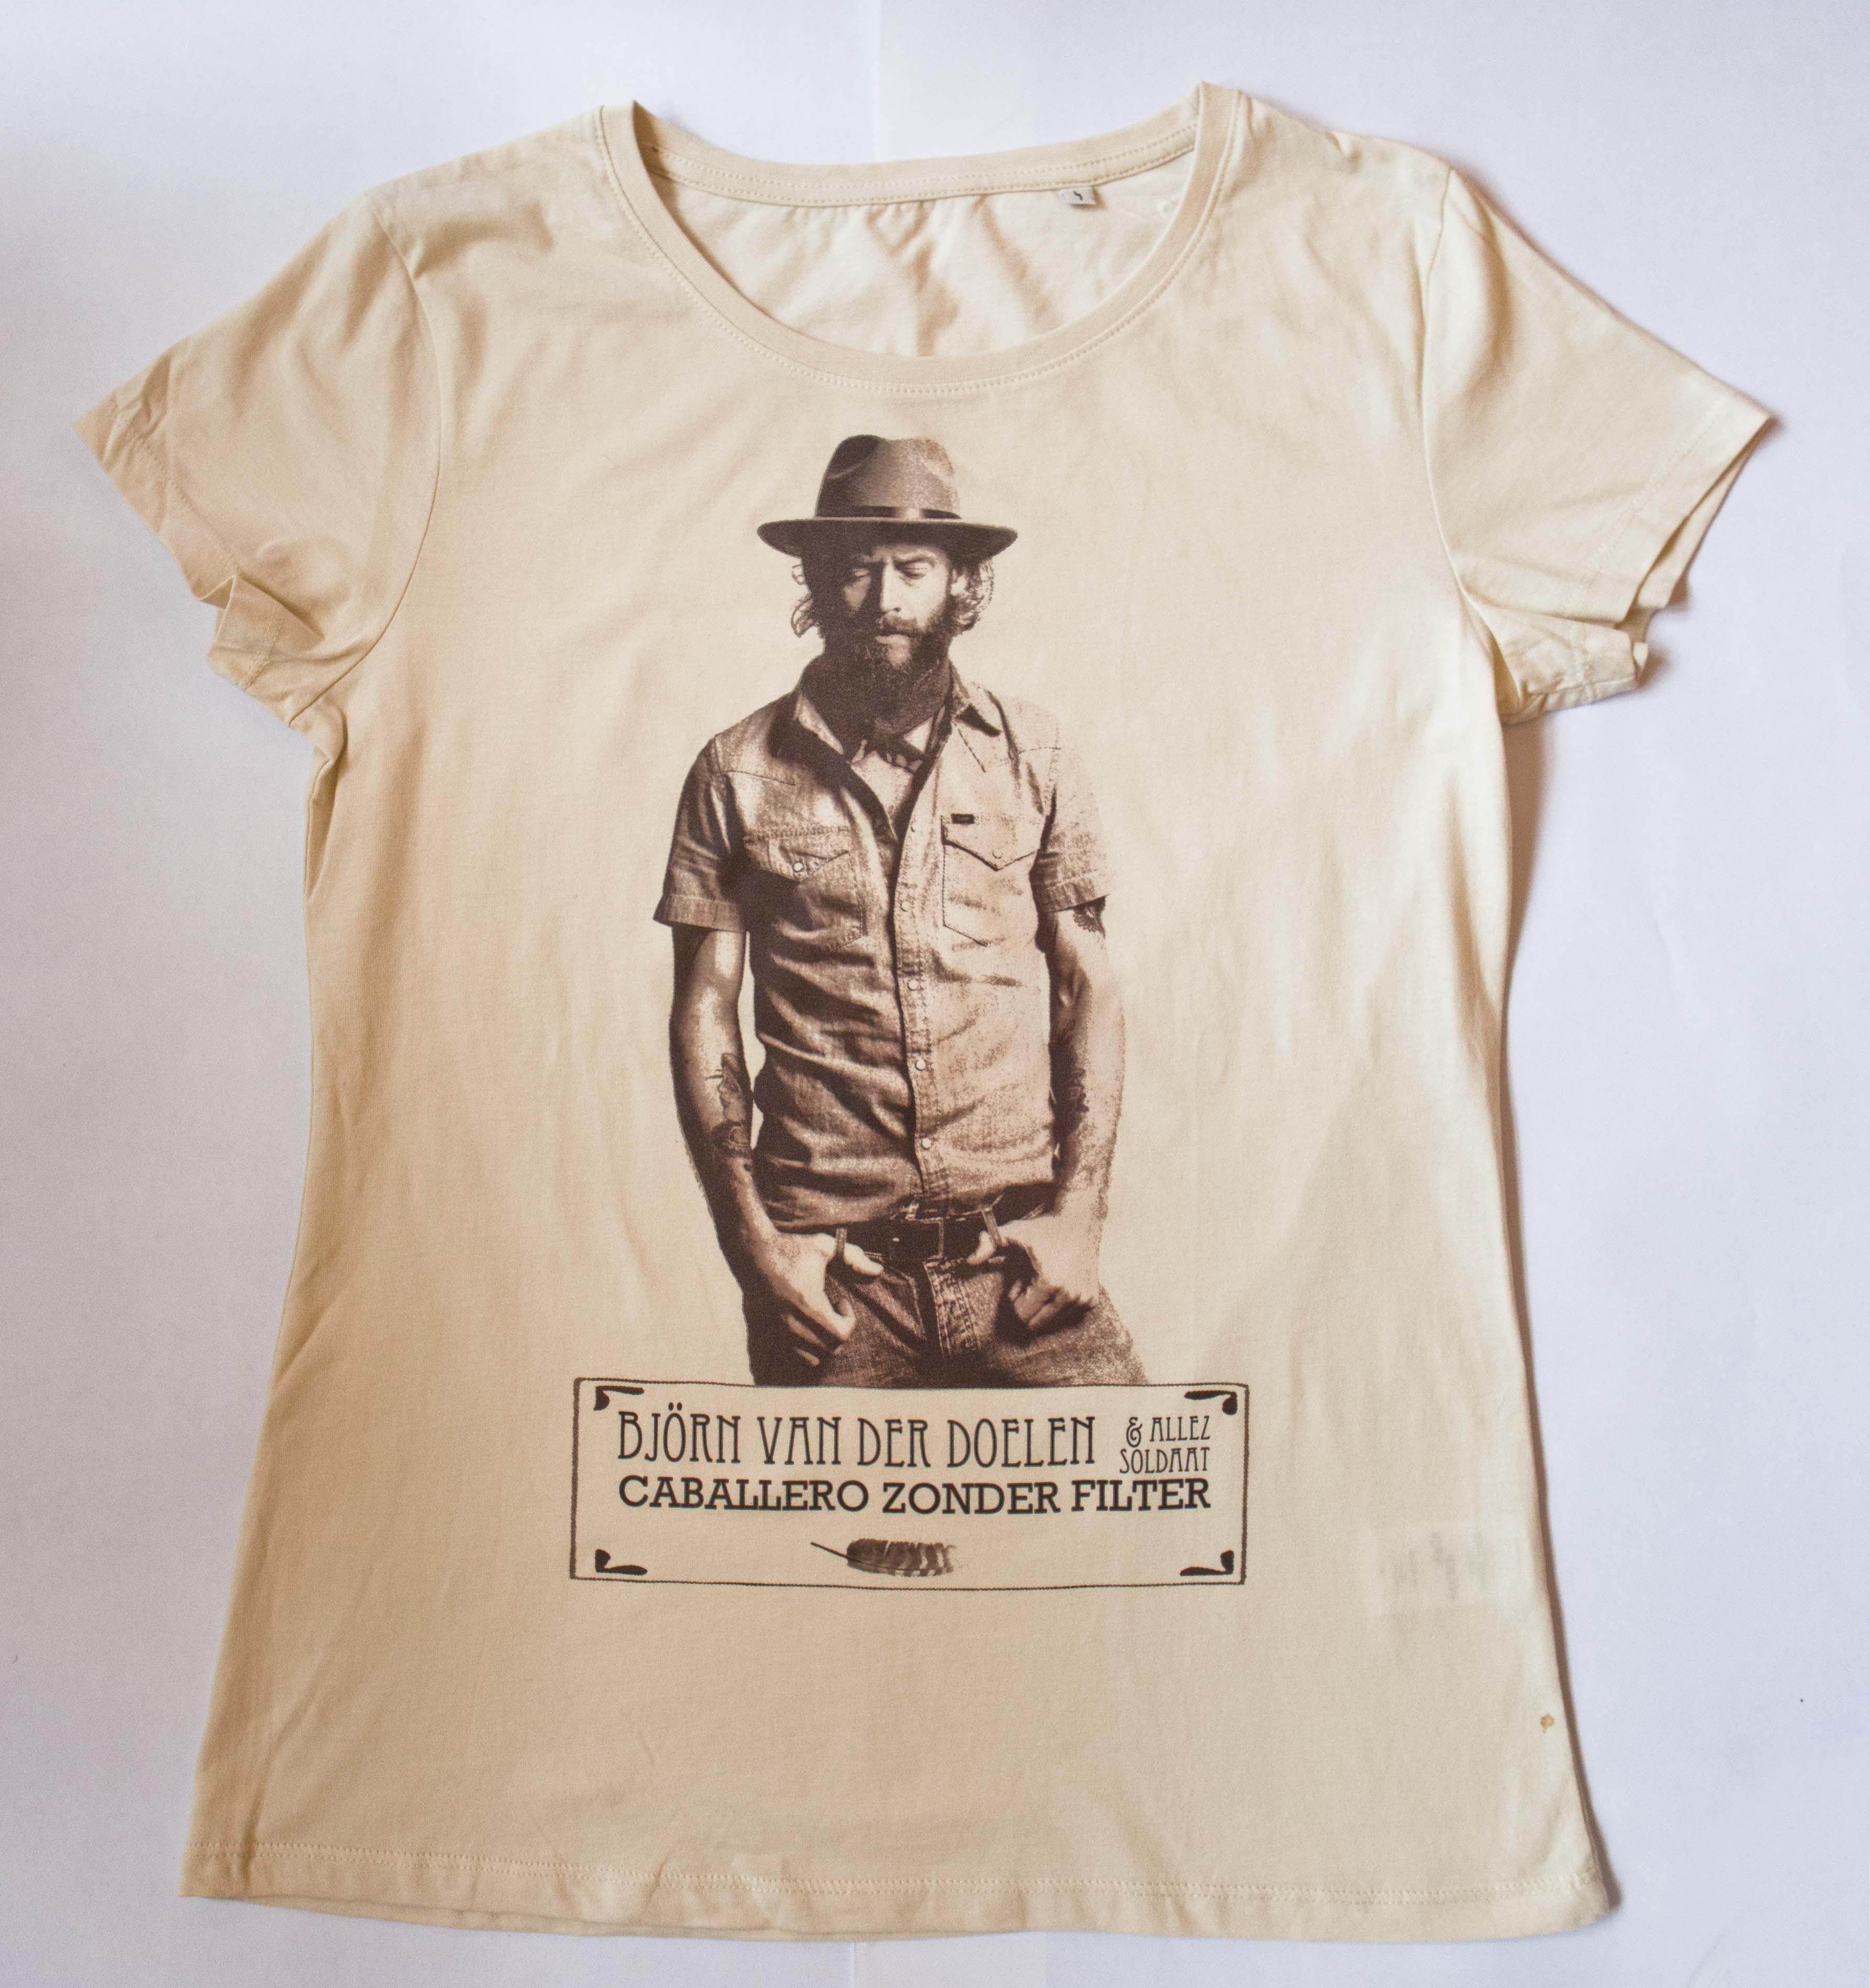 T-shirt Caballero zonder filter